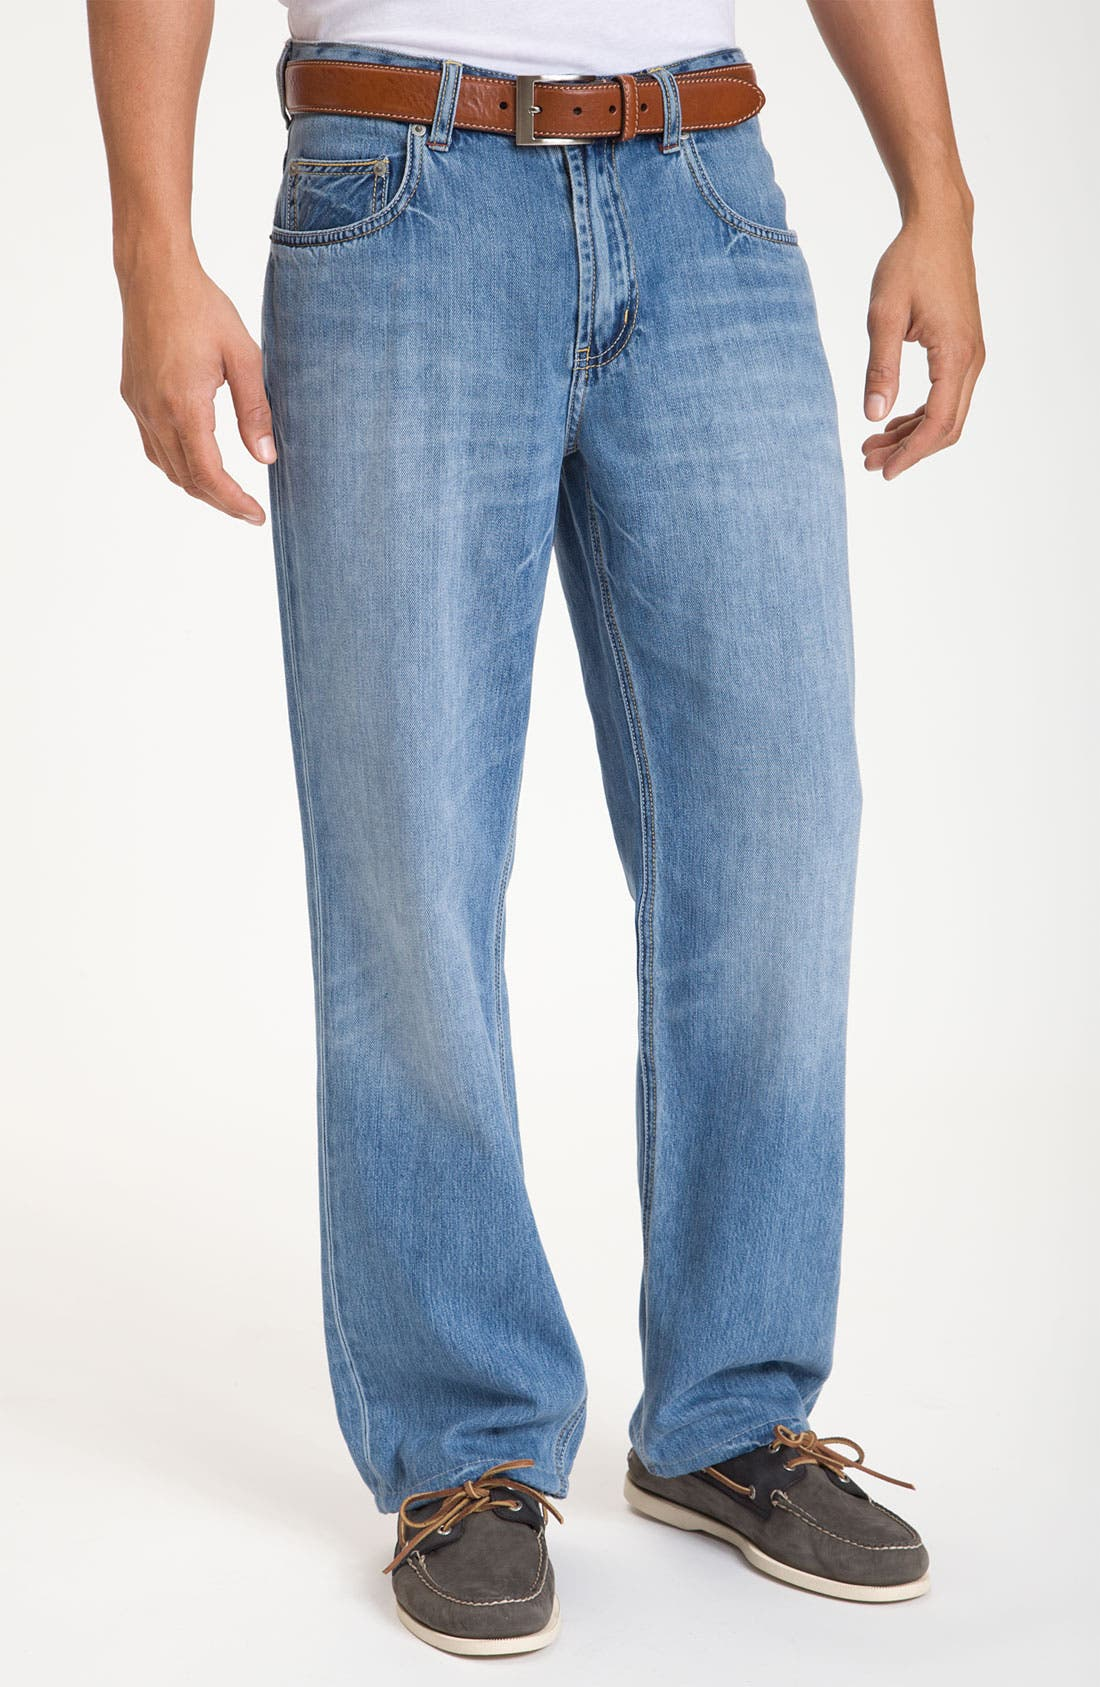 Alternate Image 1 Selected - Tommy Bahama Denim 'Island Ease' Classic Fit Jeans (Vintage Light)